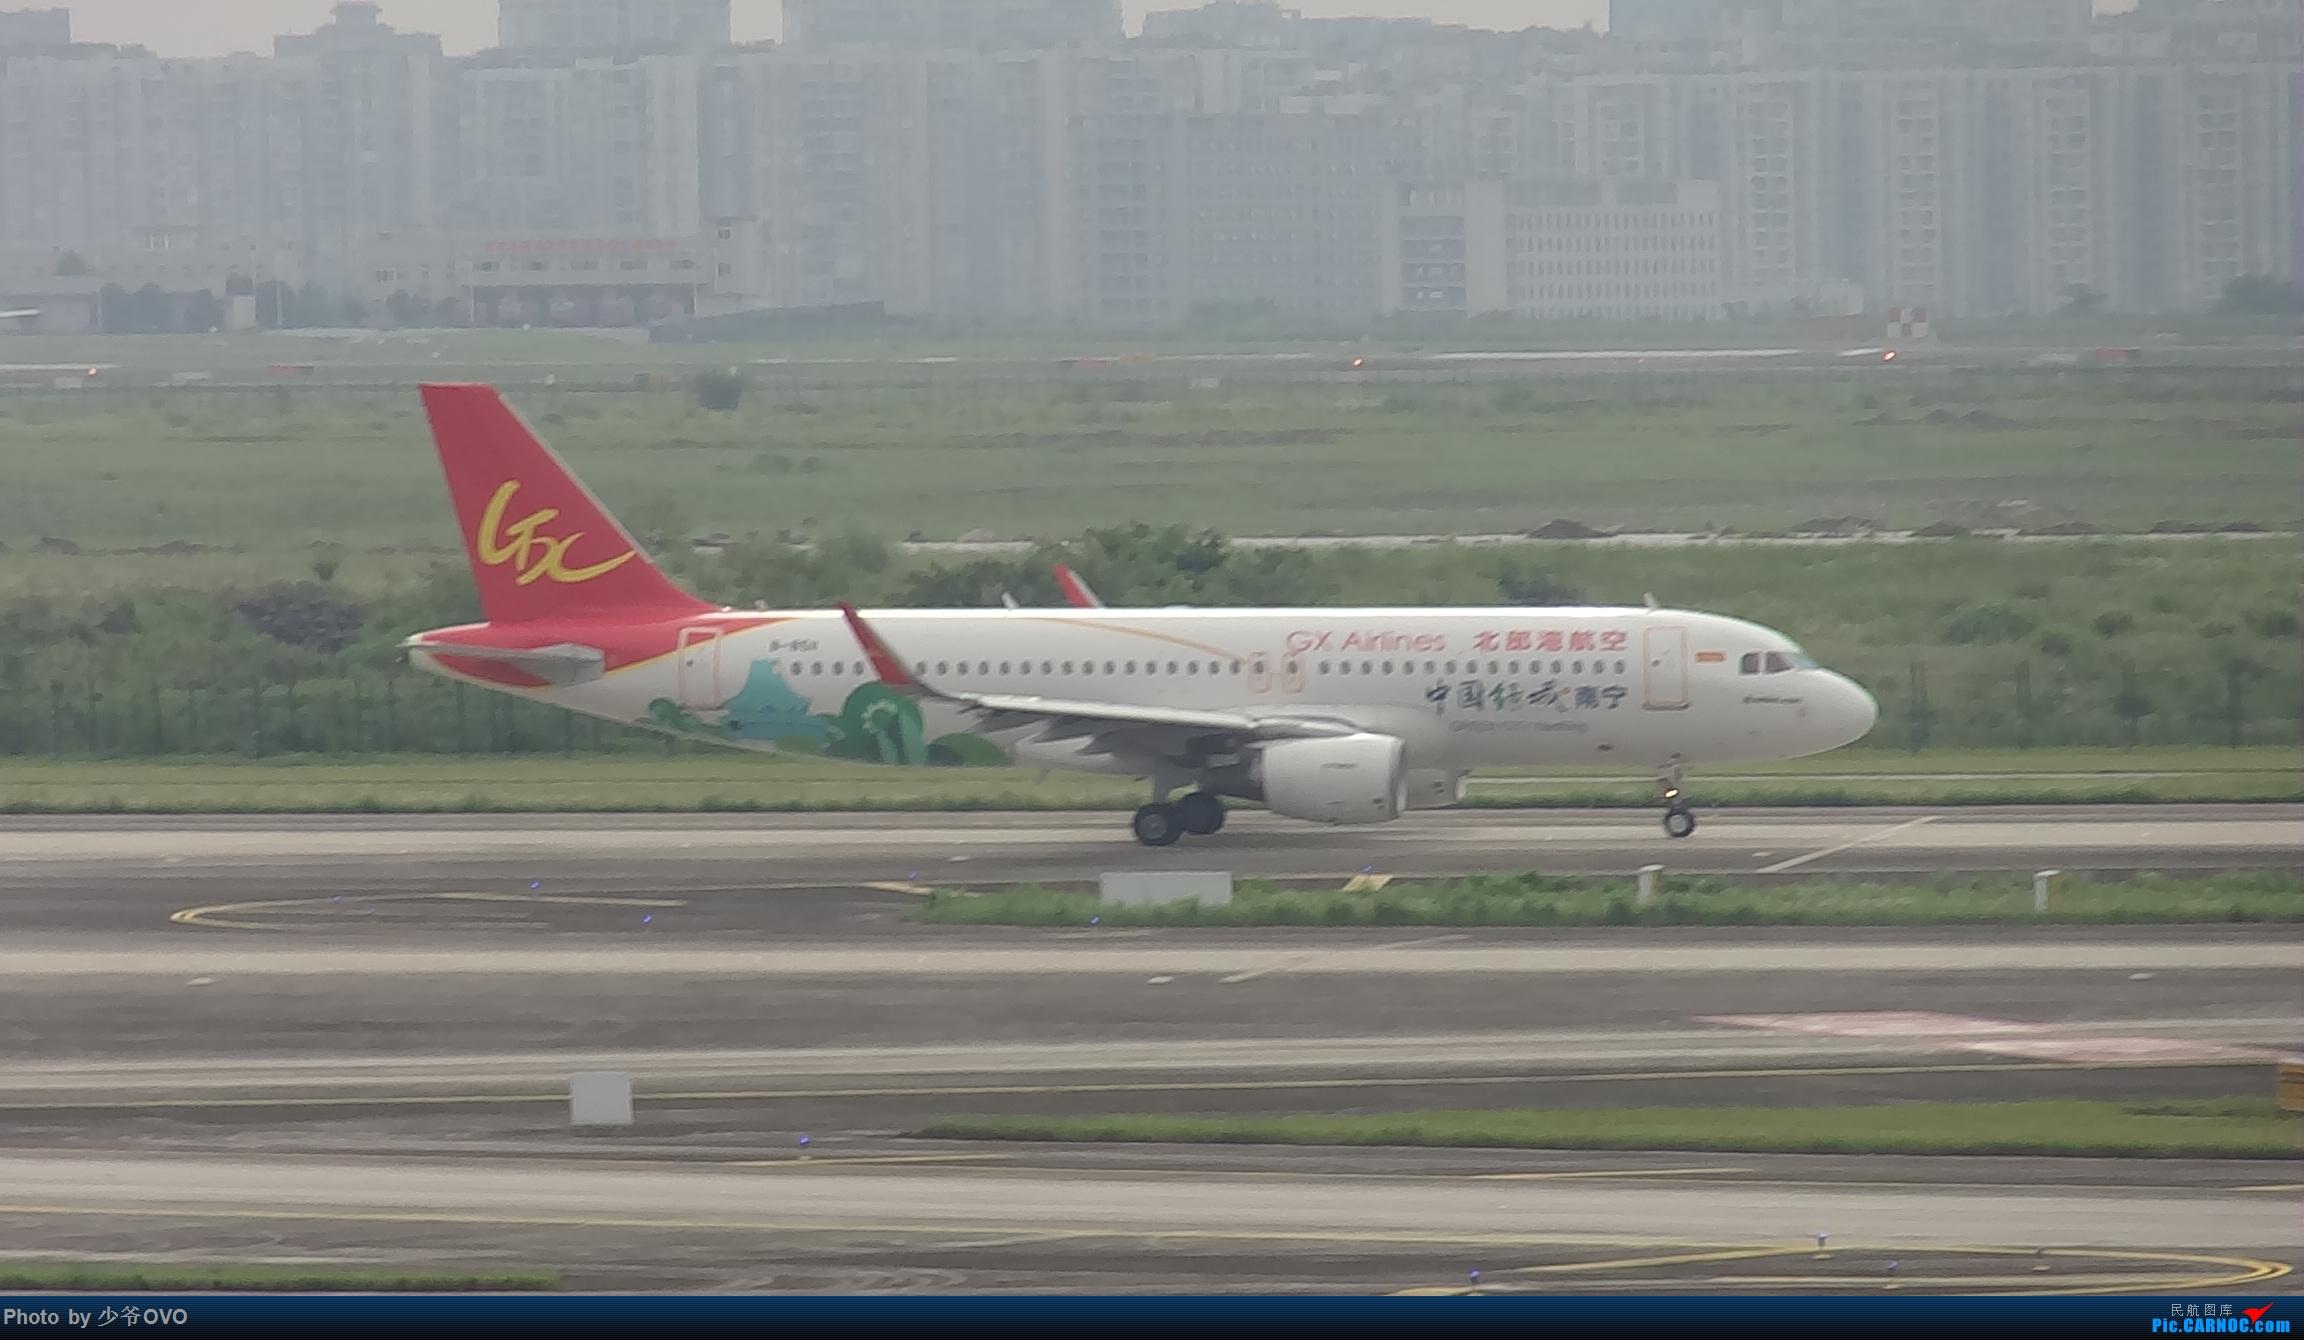 Re:[原创]CKG重庆江北机场拍机 ,中法建交50周年 AIRBUS A320-200 B-8511 中国重庆江北国际机场